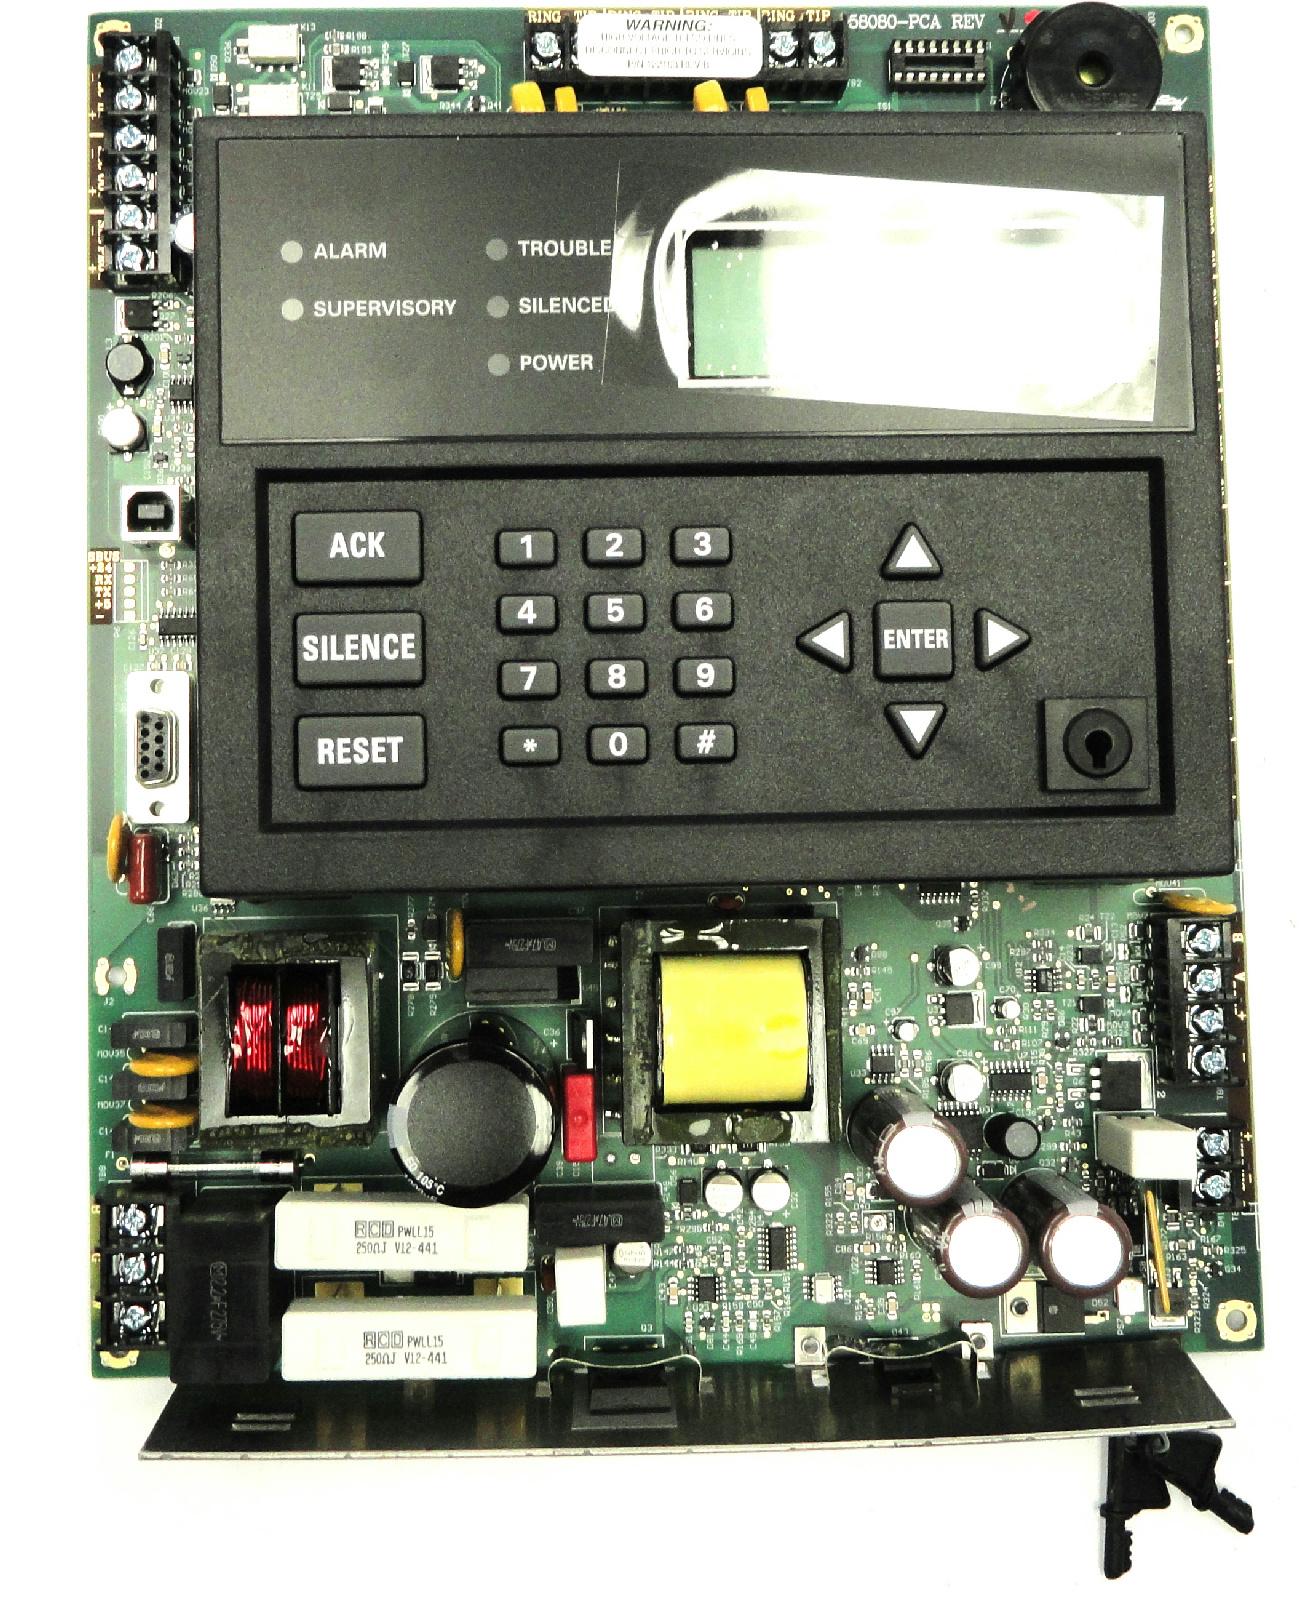 Honeywell Sk 058080 Silent Knight Addressable Fire Alarm